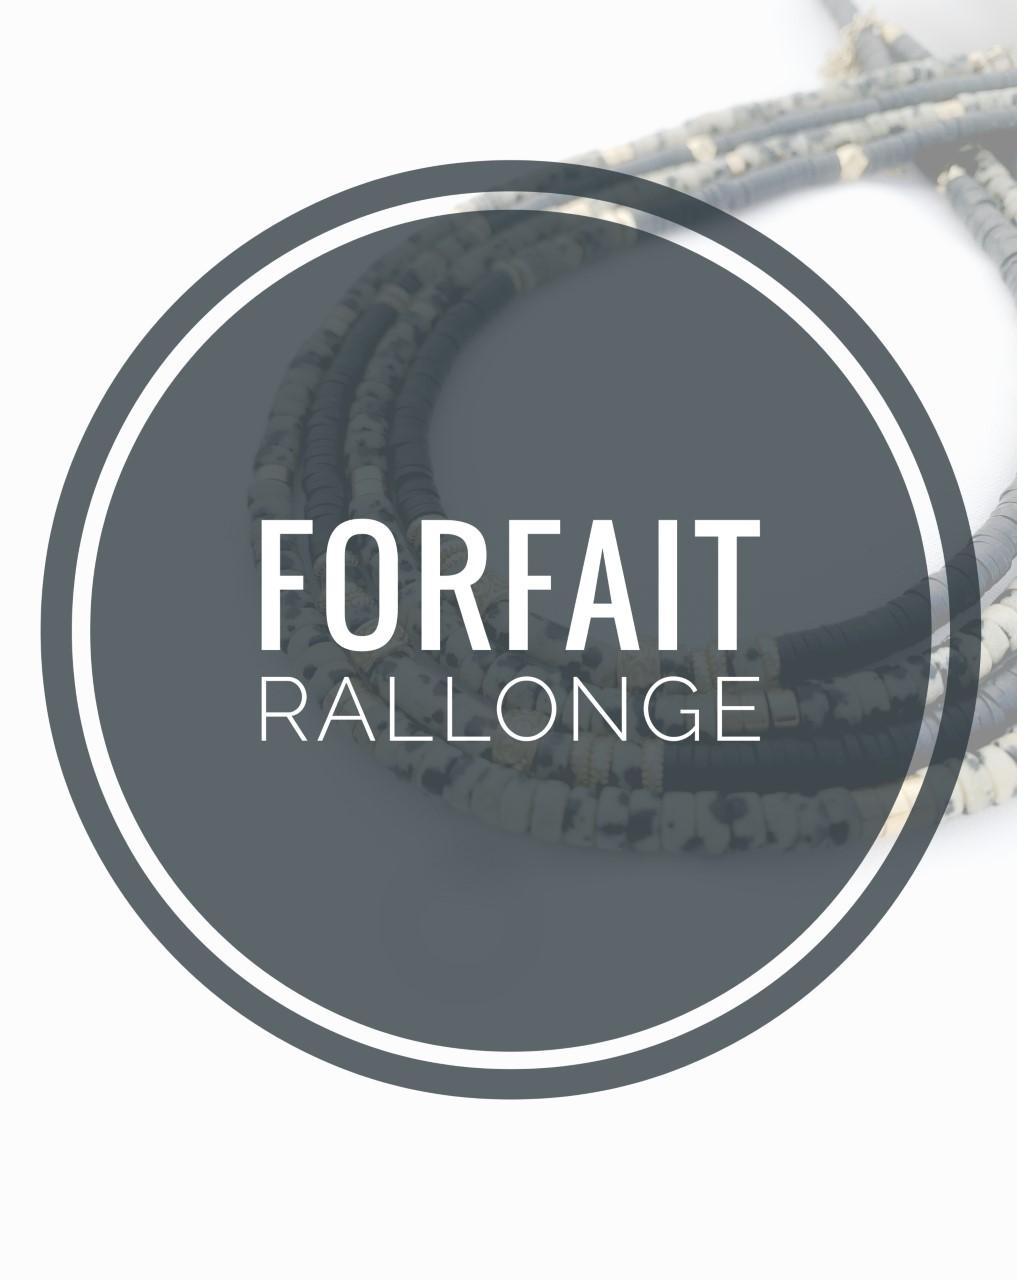 FORFAIT RALLONGE